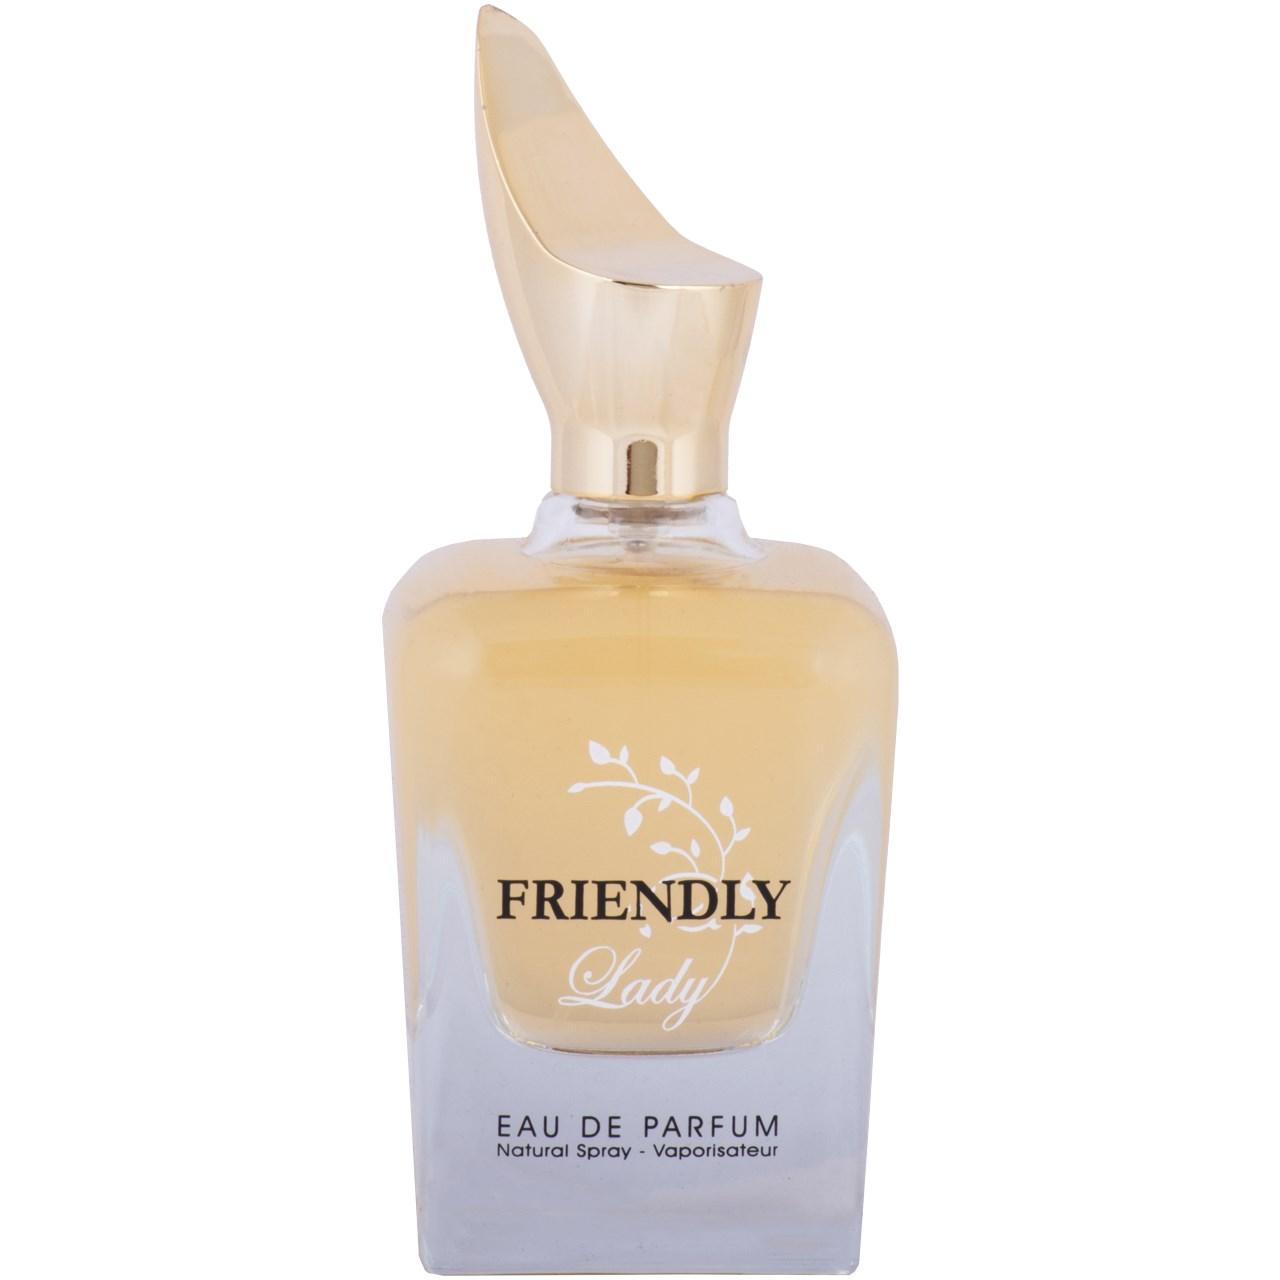 ادو پرفیوم زنانه فراگرنس ورد مدل Friendly Lady حجم 100 میلی لیتر